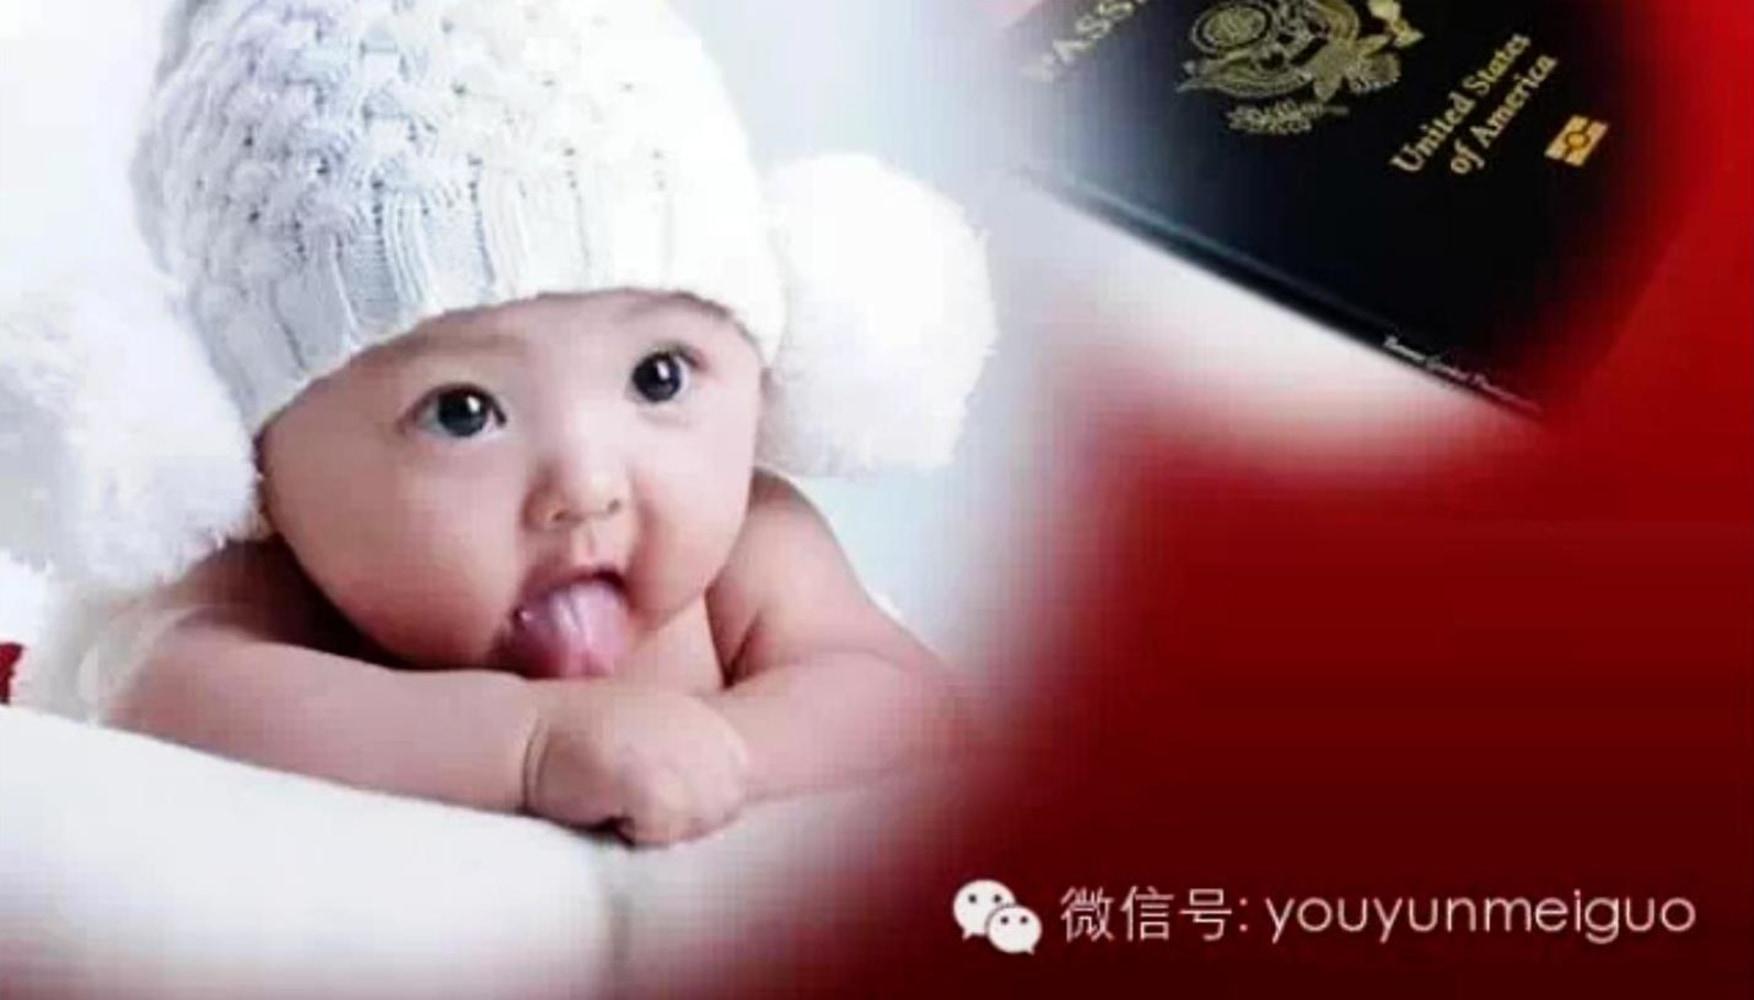 Quarter Korean Baby their babies  youyunmeiguo